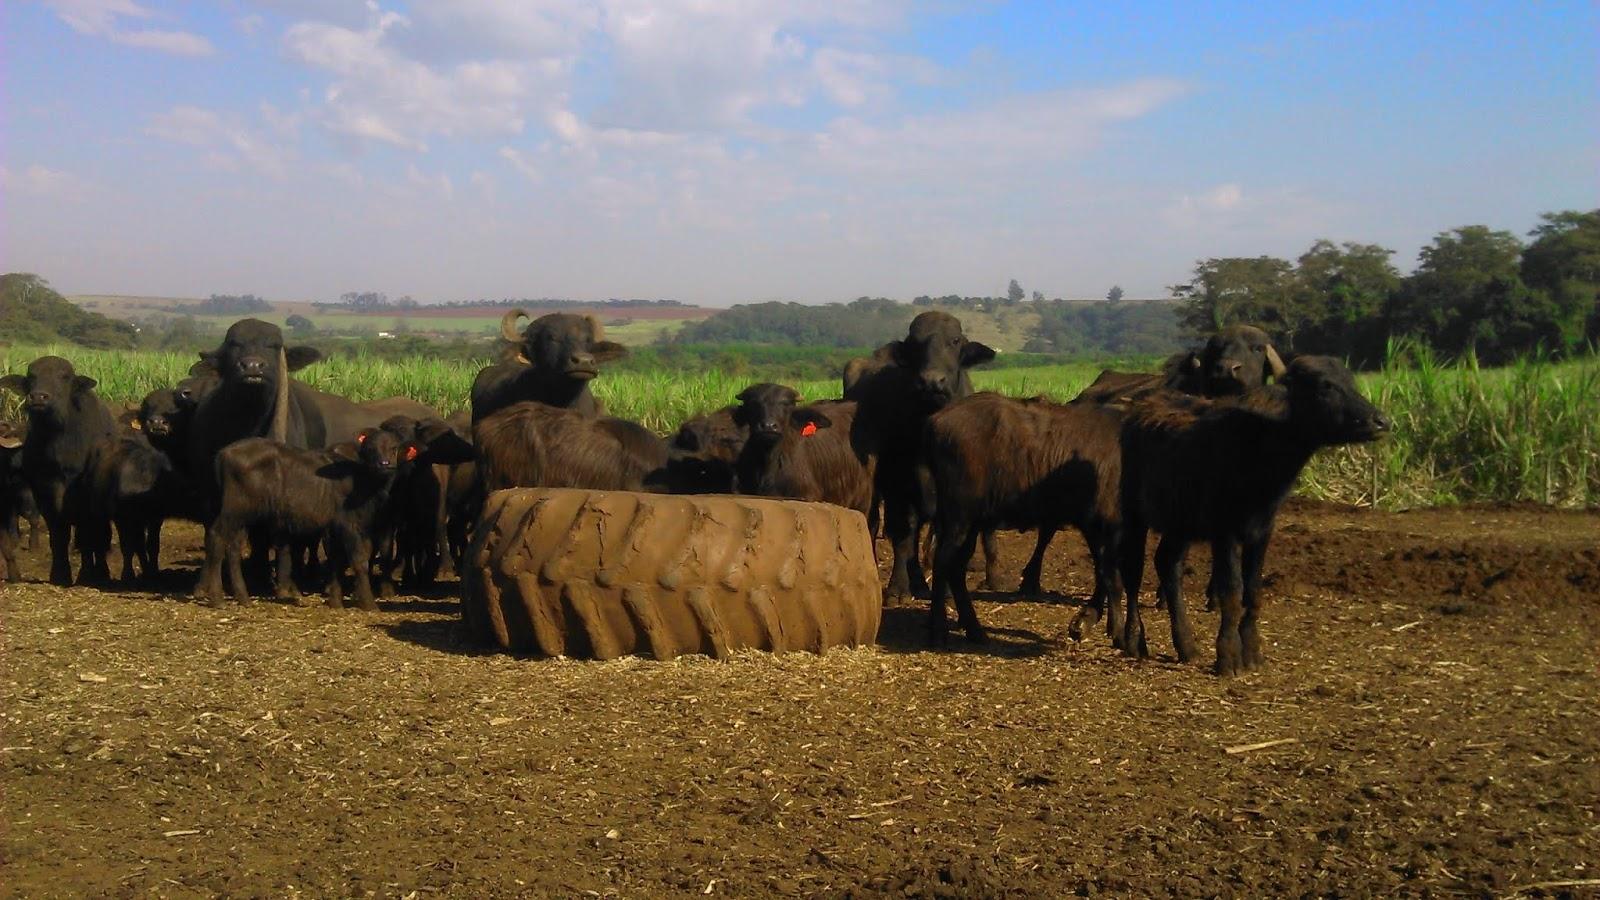 Rebanho de Búfalos no  Brasil | Bubalinos